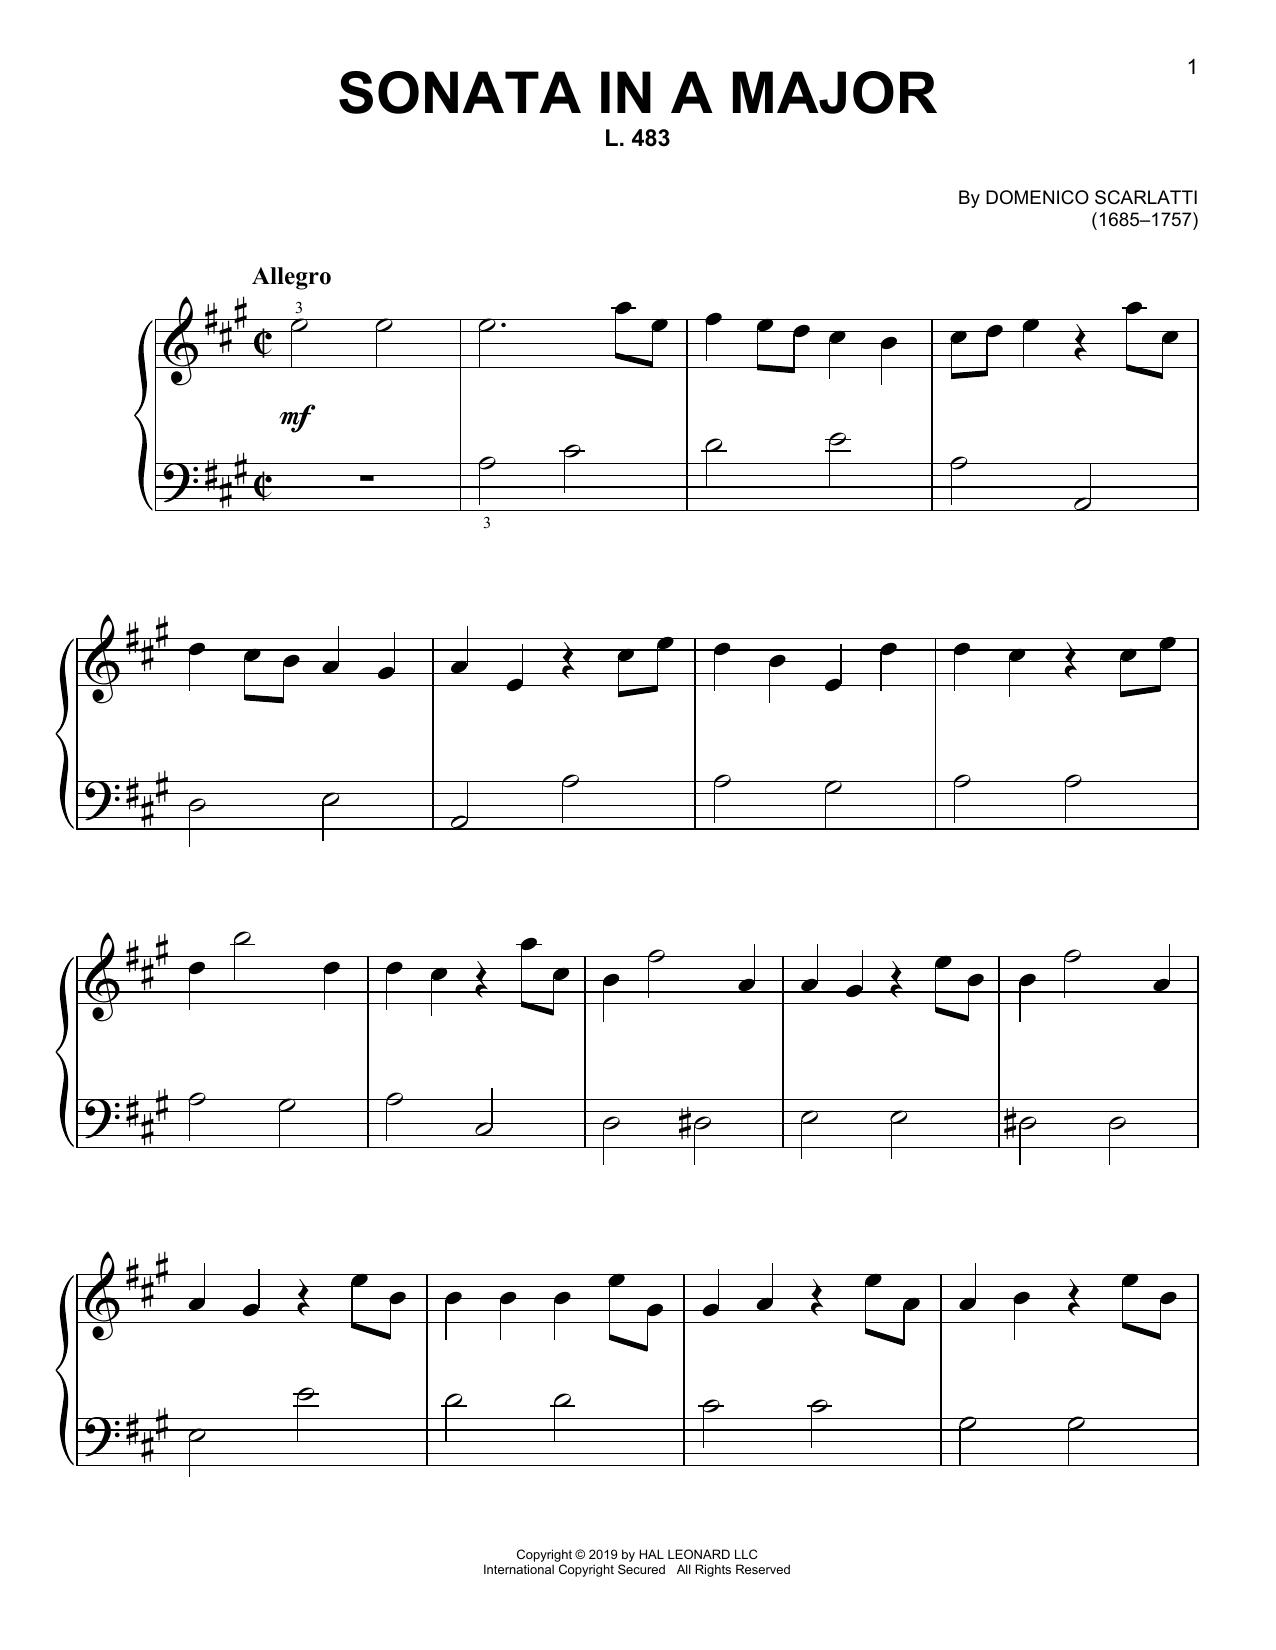 Domenico Scarlatti Sonata In A Major, L. 483 sheet music notes and chords